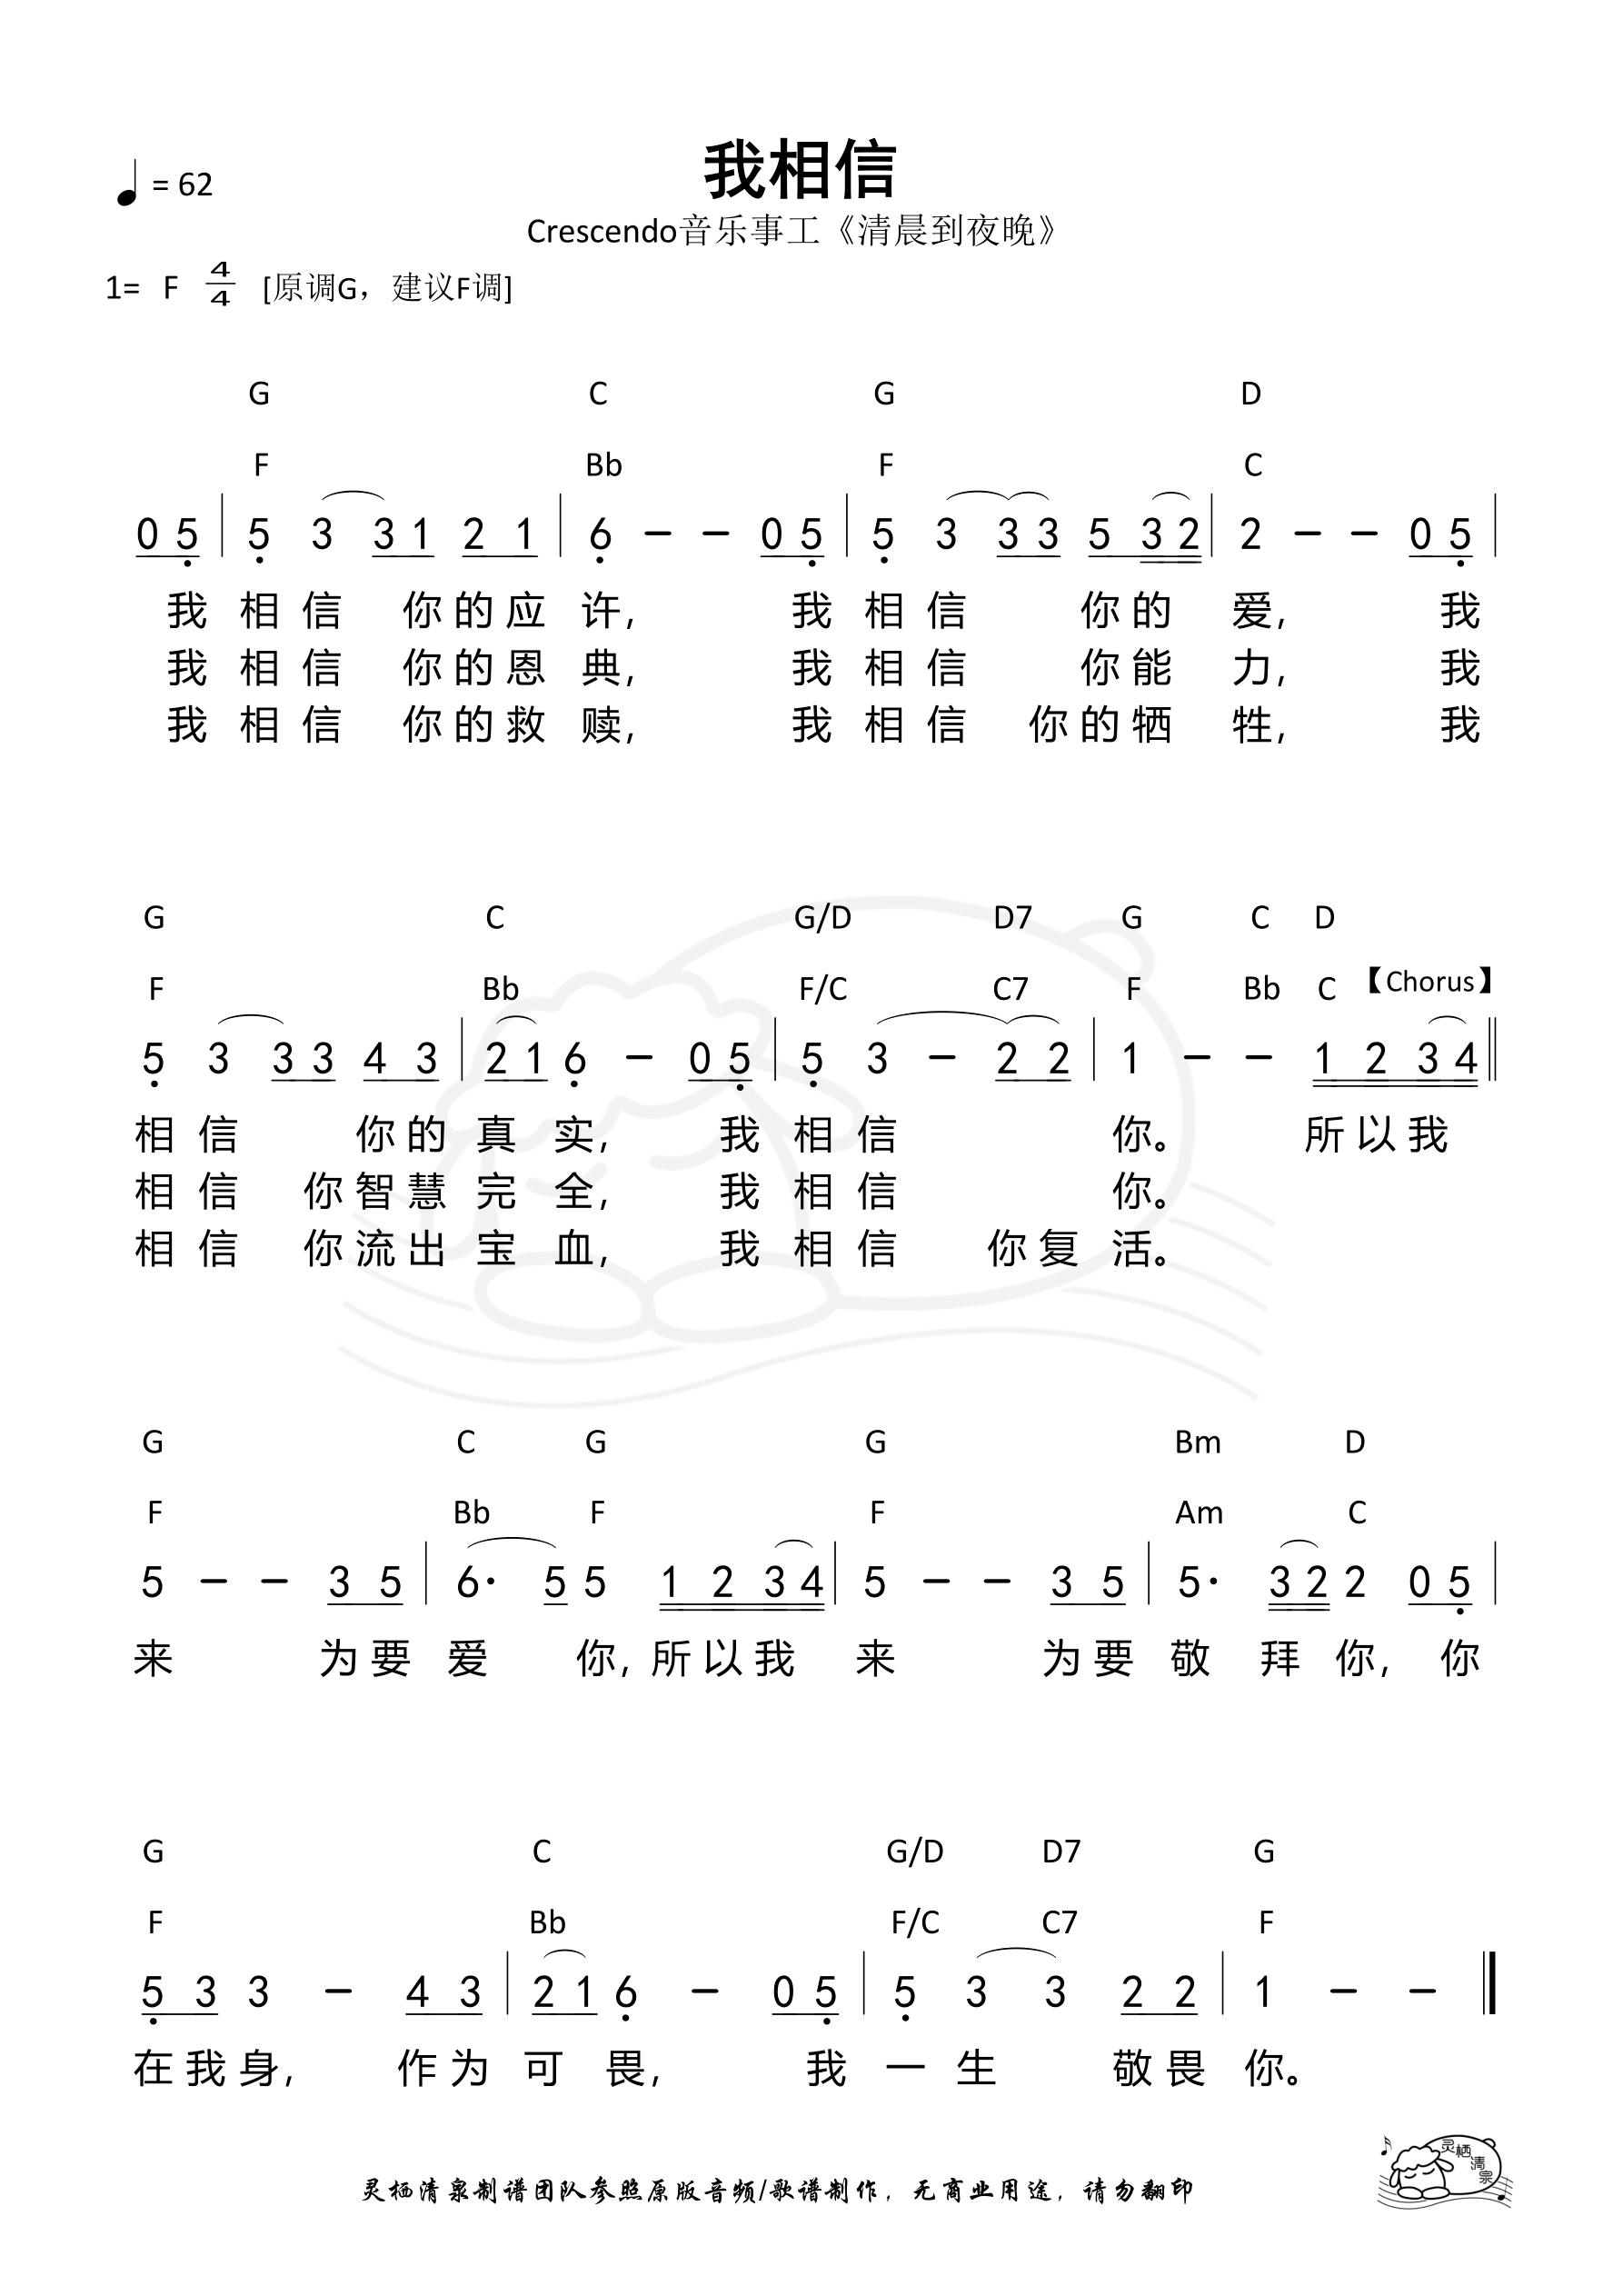 《第974首 - 我相信(Crescendo)和弦简谱》